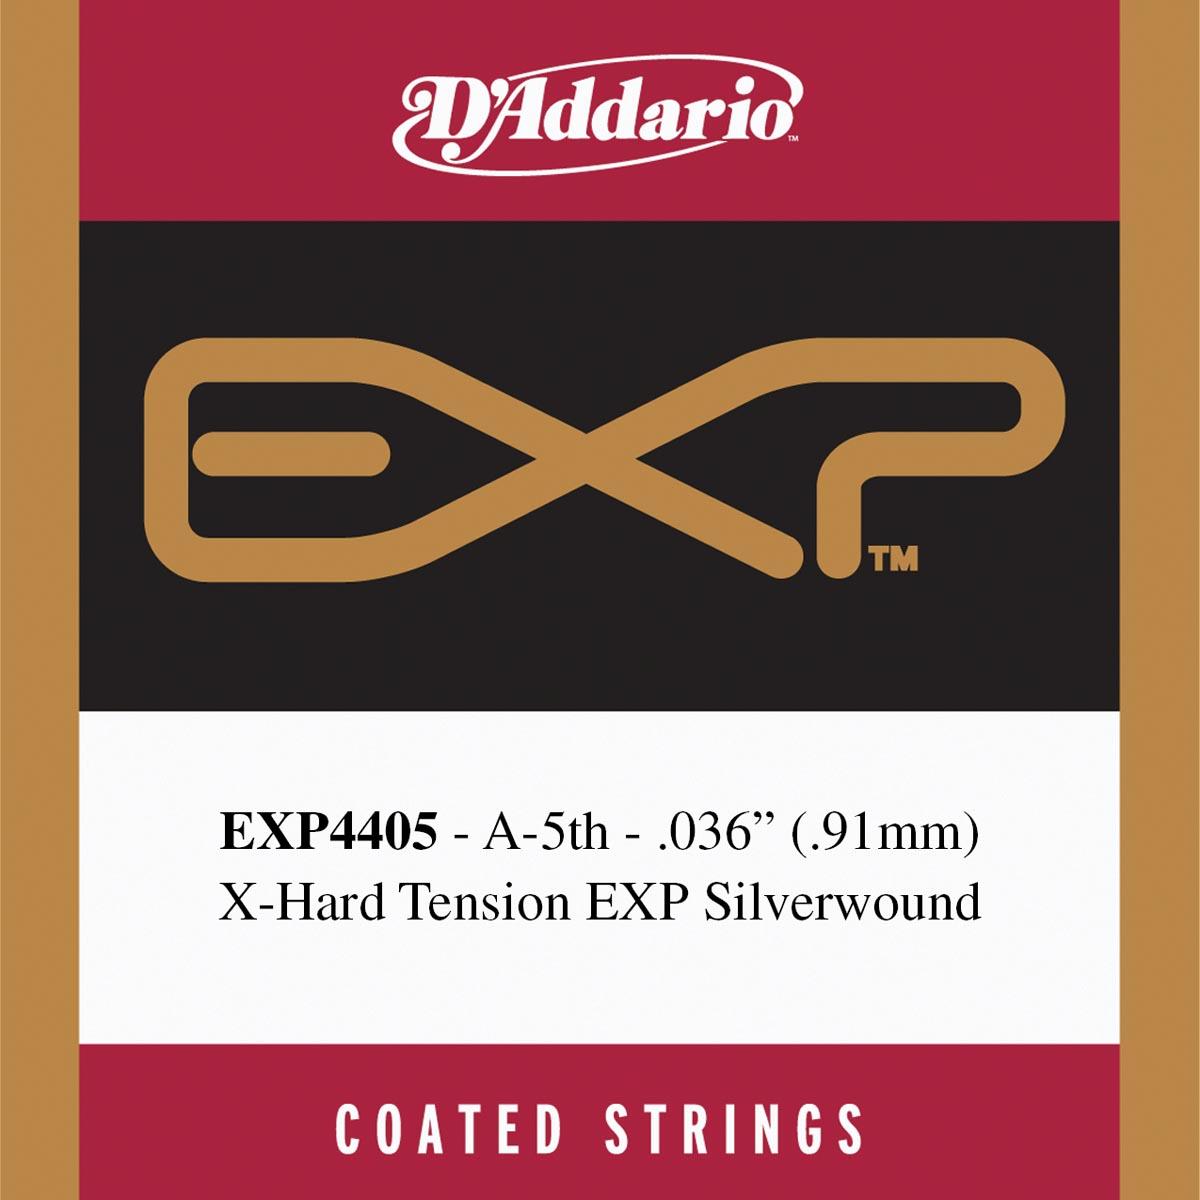 D'ADDARIO EXP4405